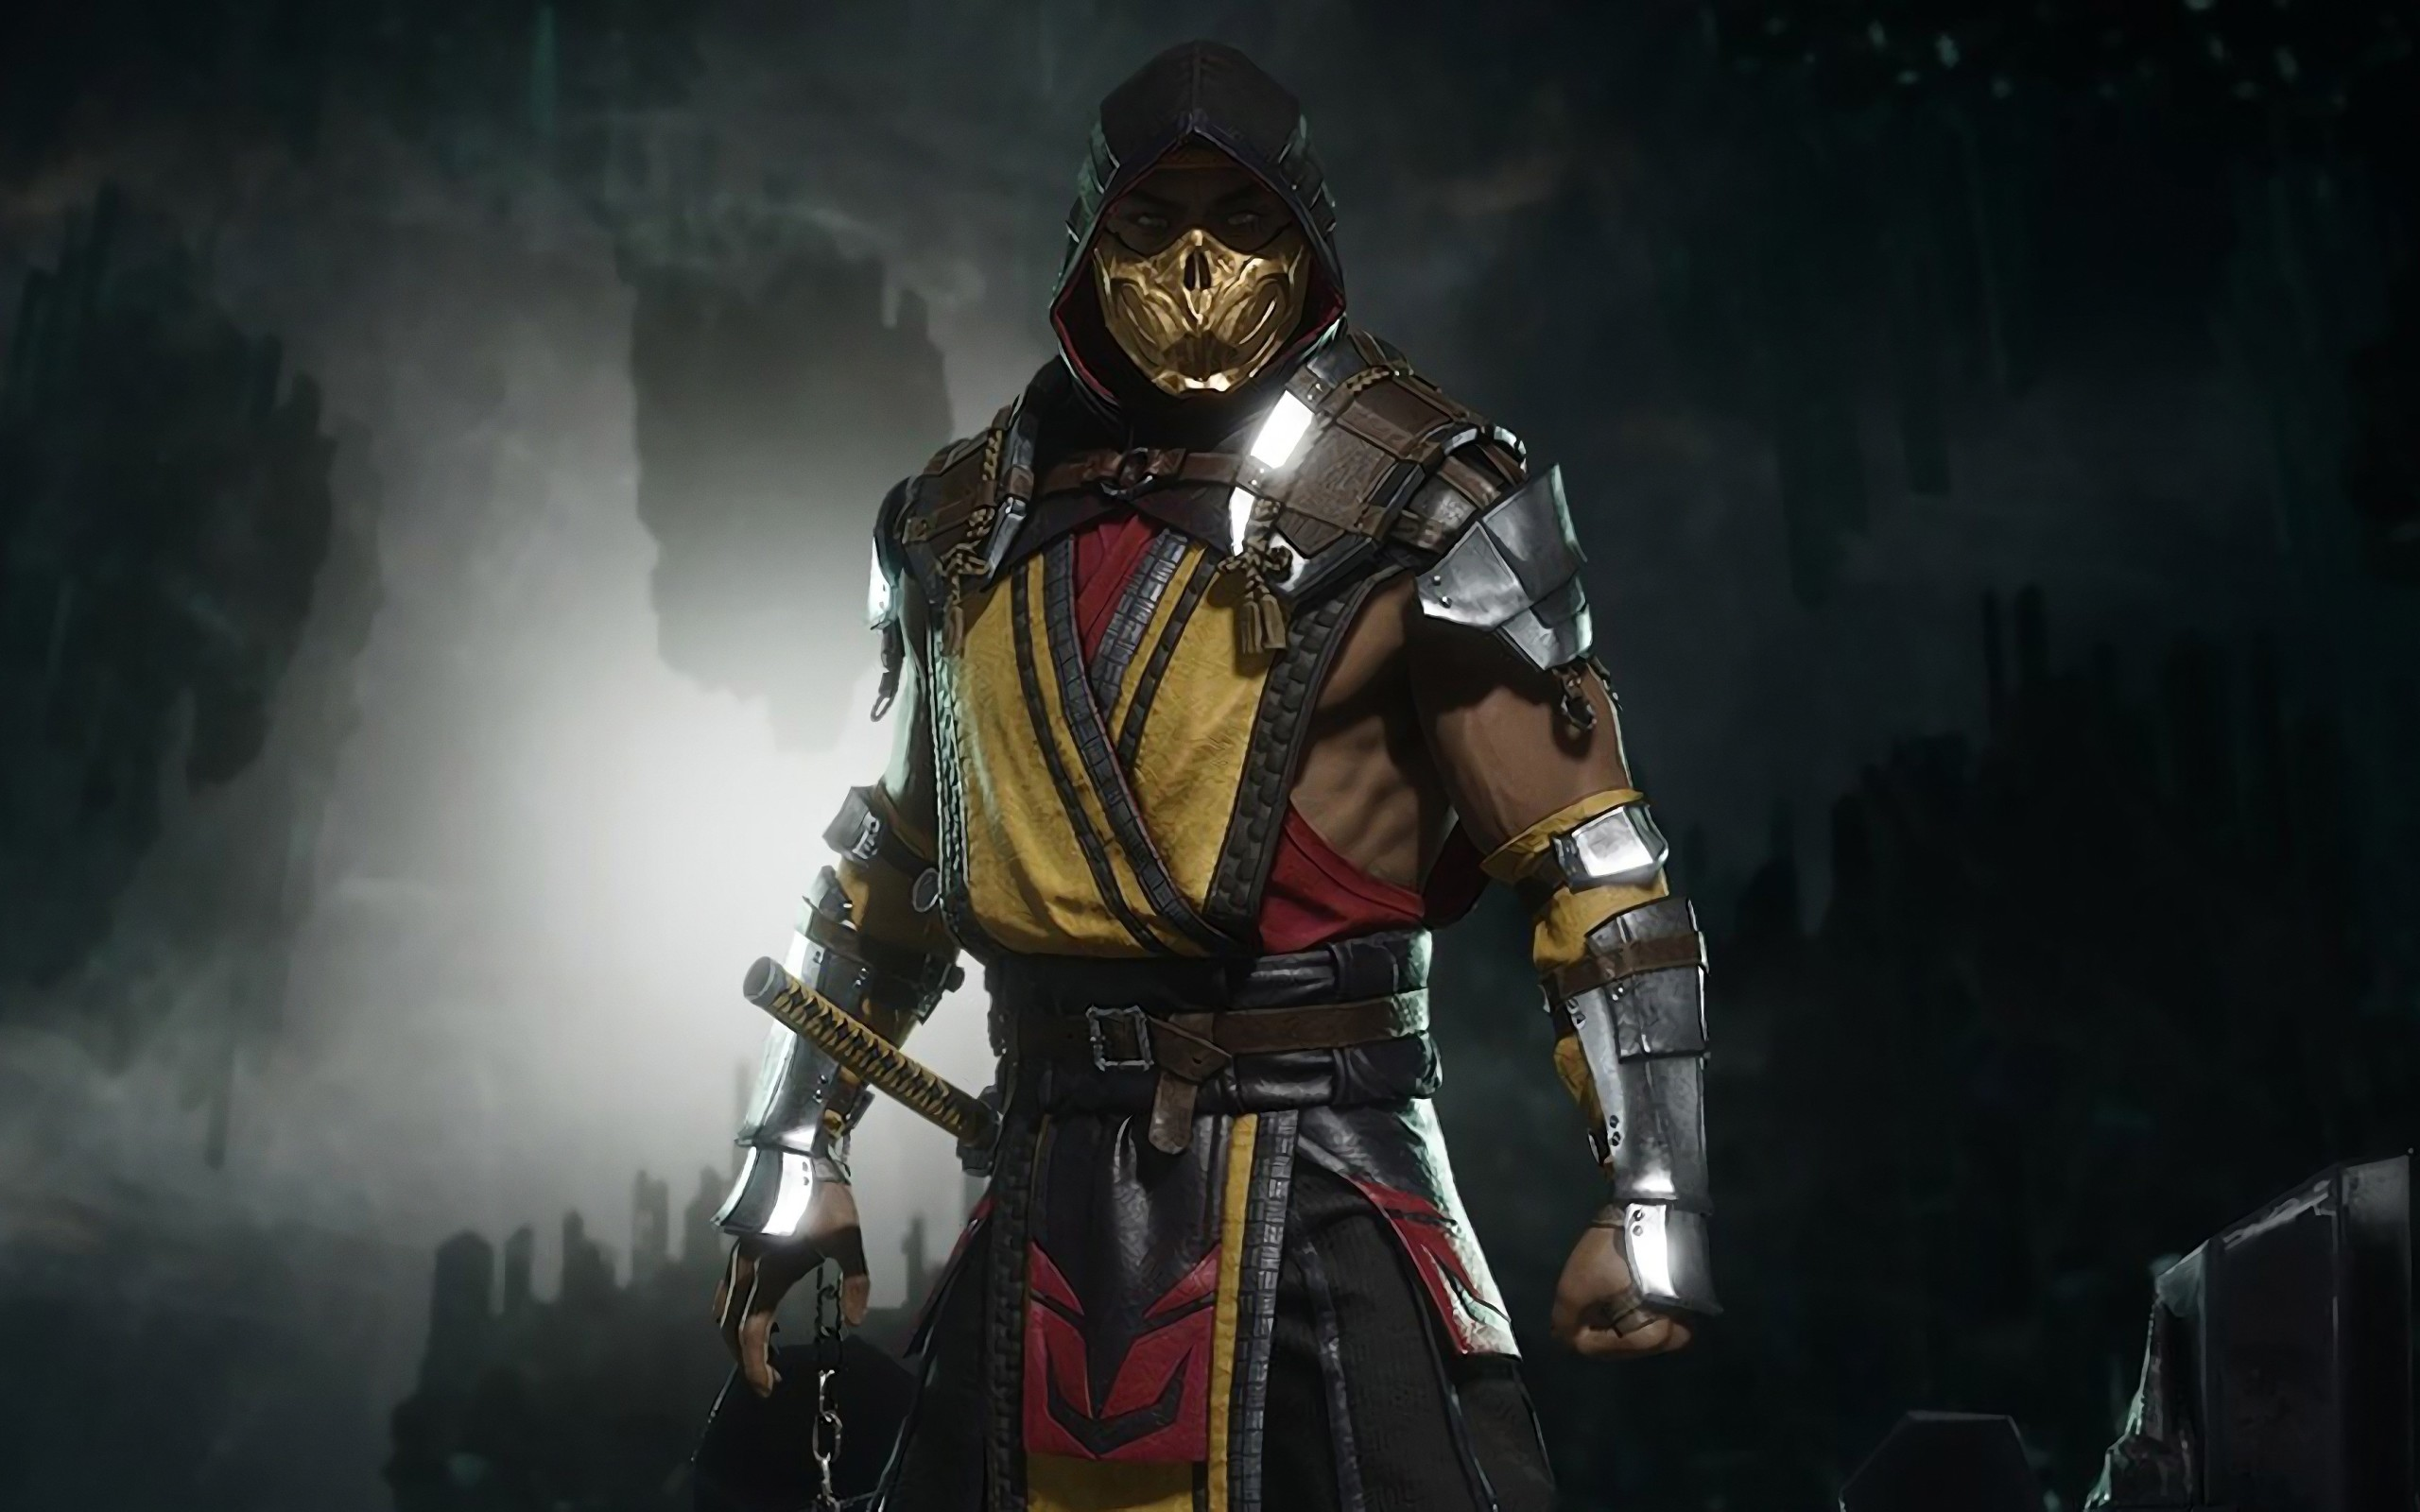 Res: 2560x1600, Wallpaper of Scorpion, Mortal Kombat, Mortal Kombat 11, XI background & HD  image